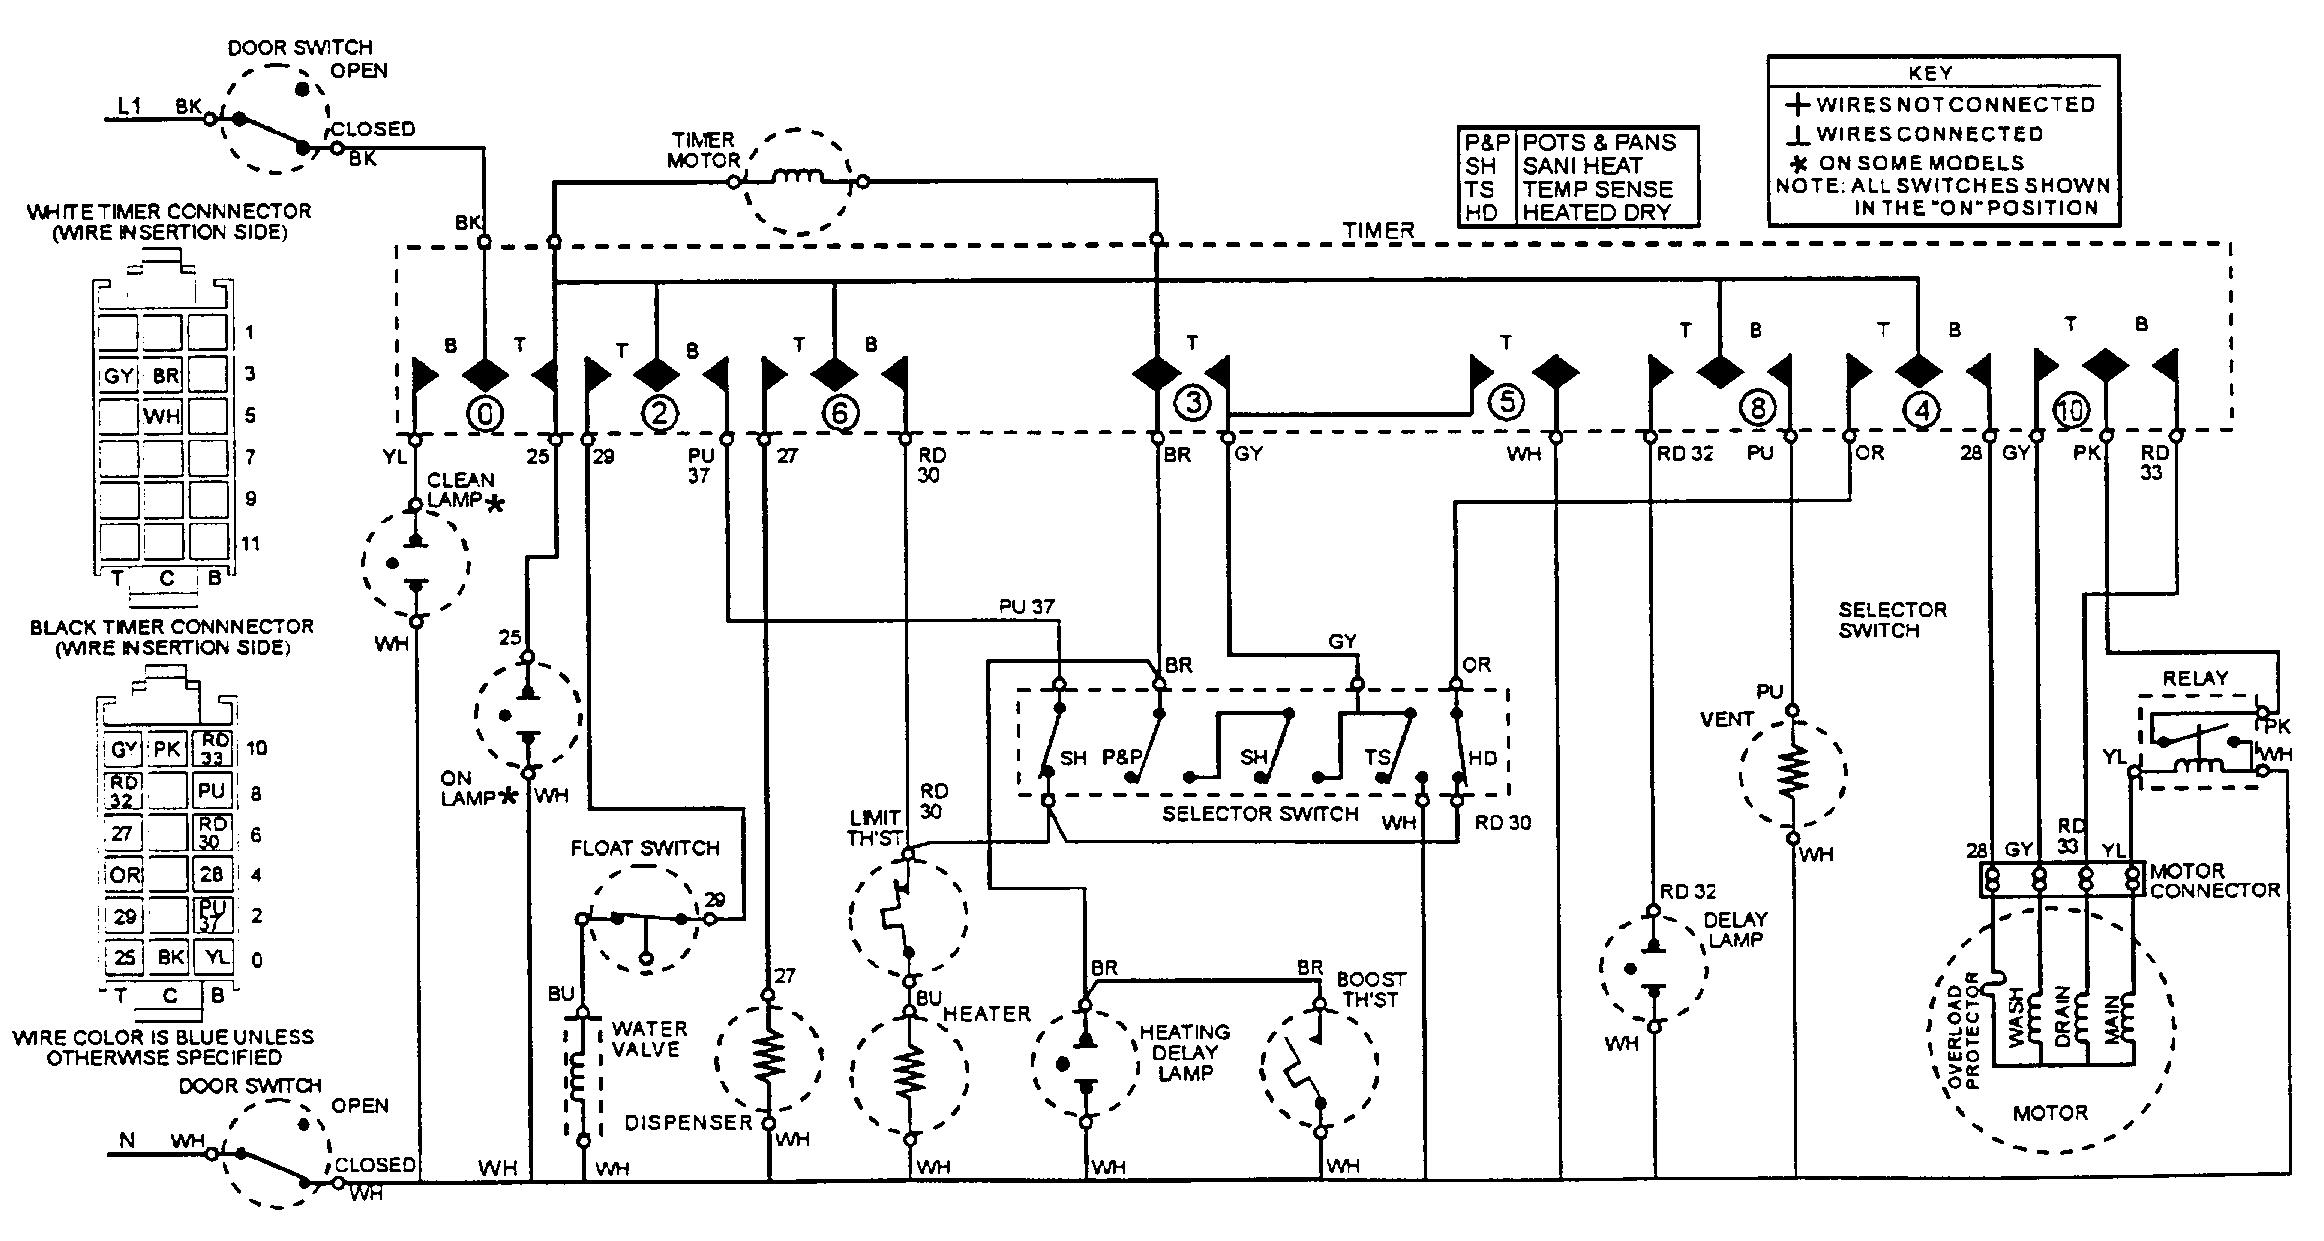 Maytag model MDB4040AWB dishwasher genuine parts